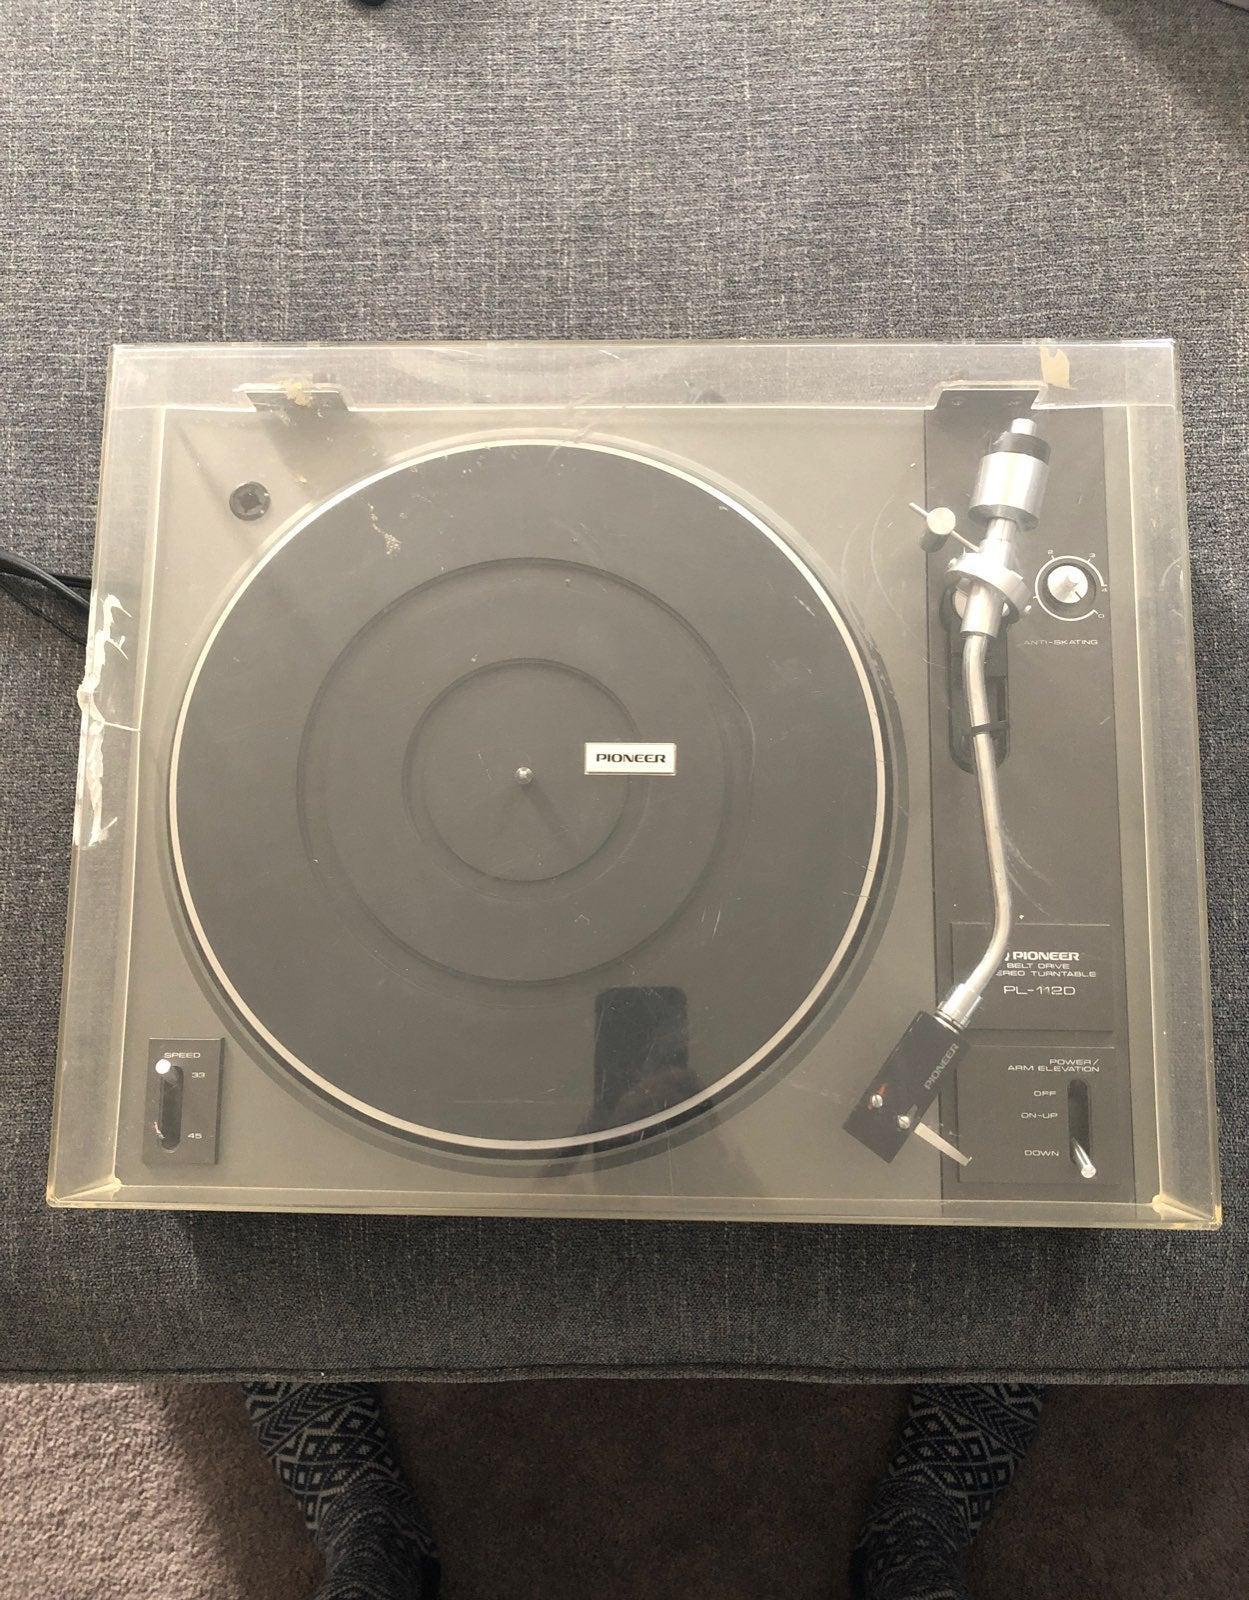 Pioneer PL-112D Turntable